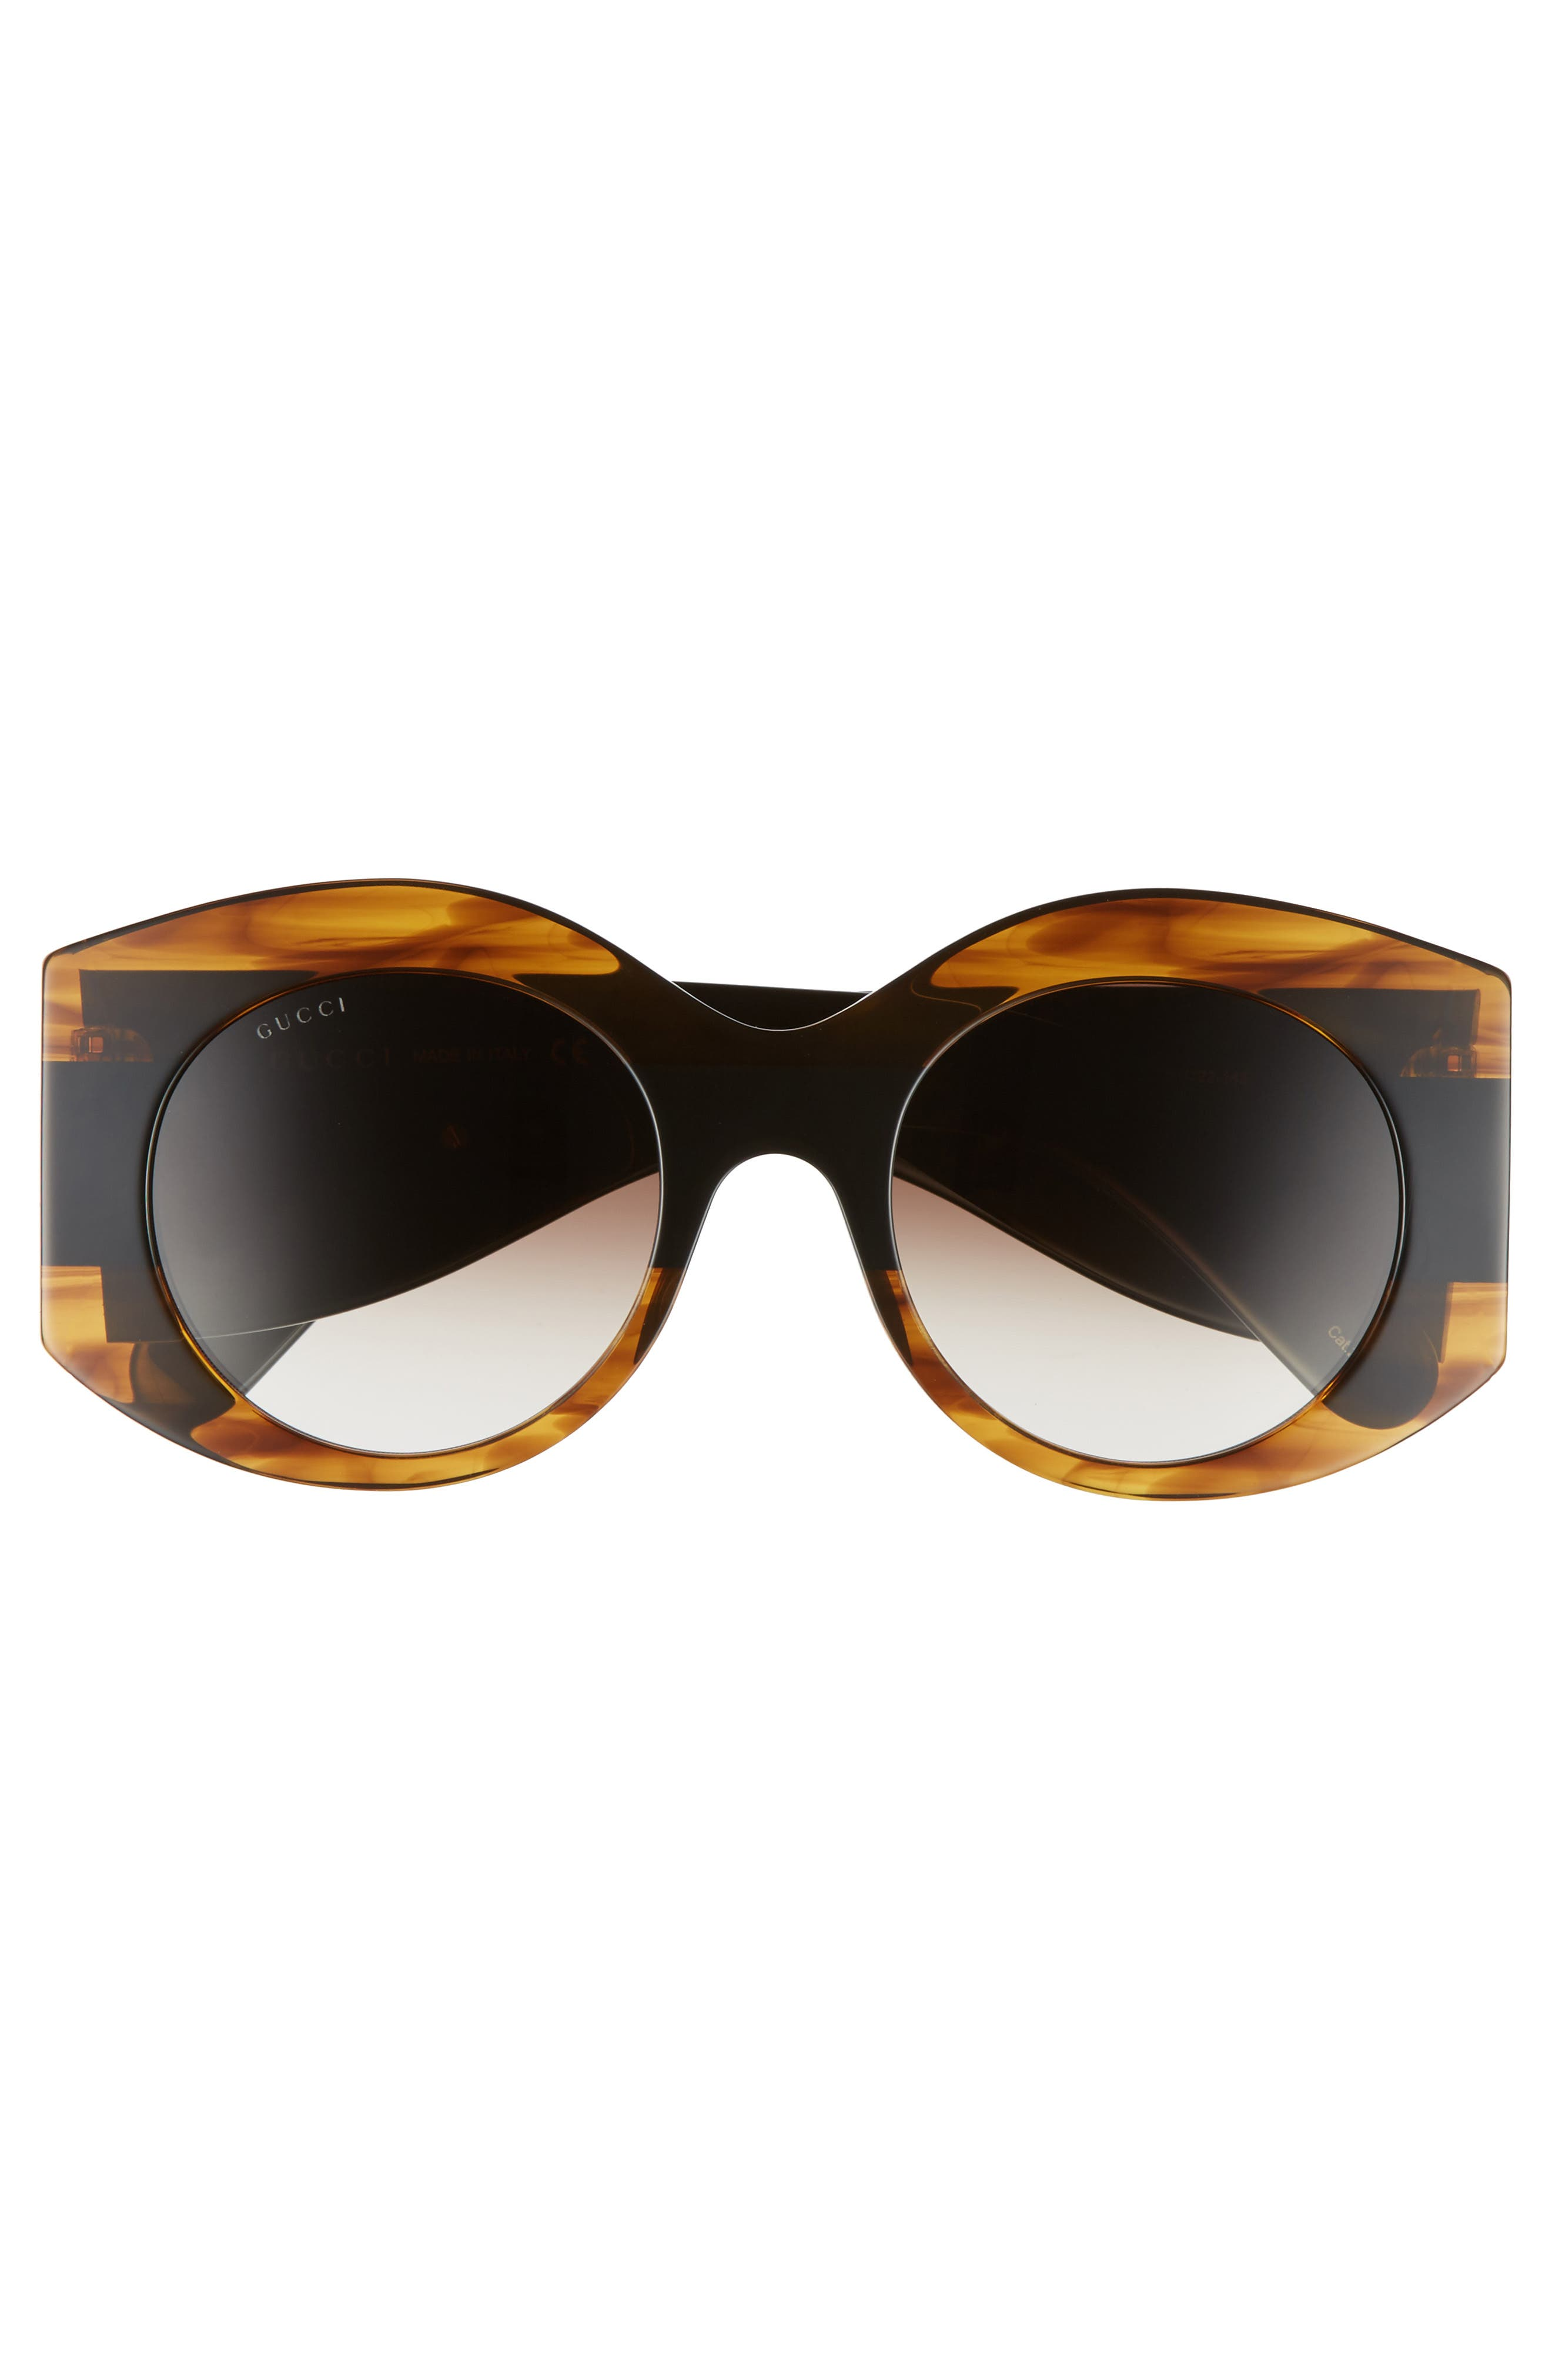 51mm Transparent Stripe Sunglasses,                             Alternate thumbnail 3, color,                             201